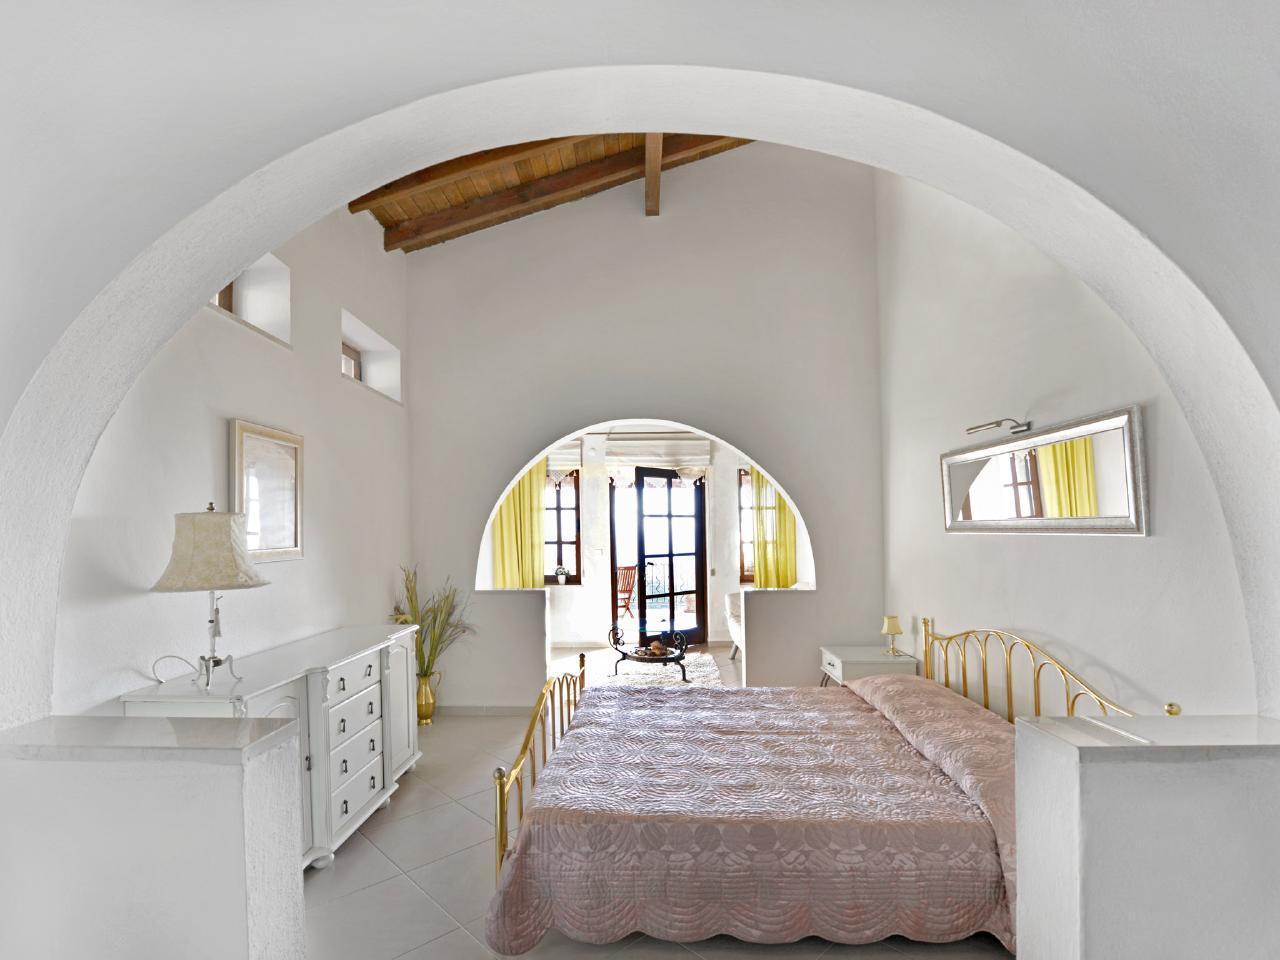 Maison de vacances Exklusives Chalet, romantisch am Berghang und Meer gelegen (2506674), Mesudiye, , Région Egéenne, Turquie, image 9